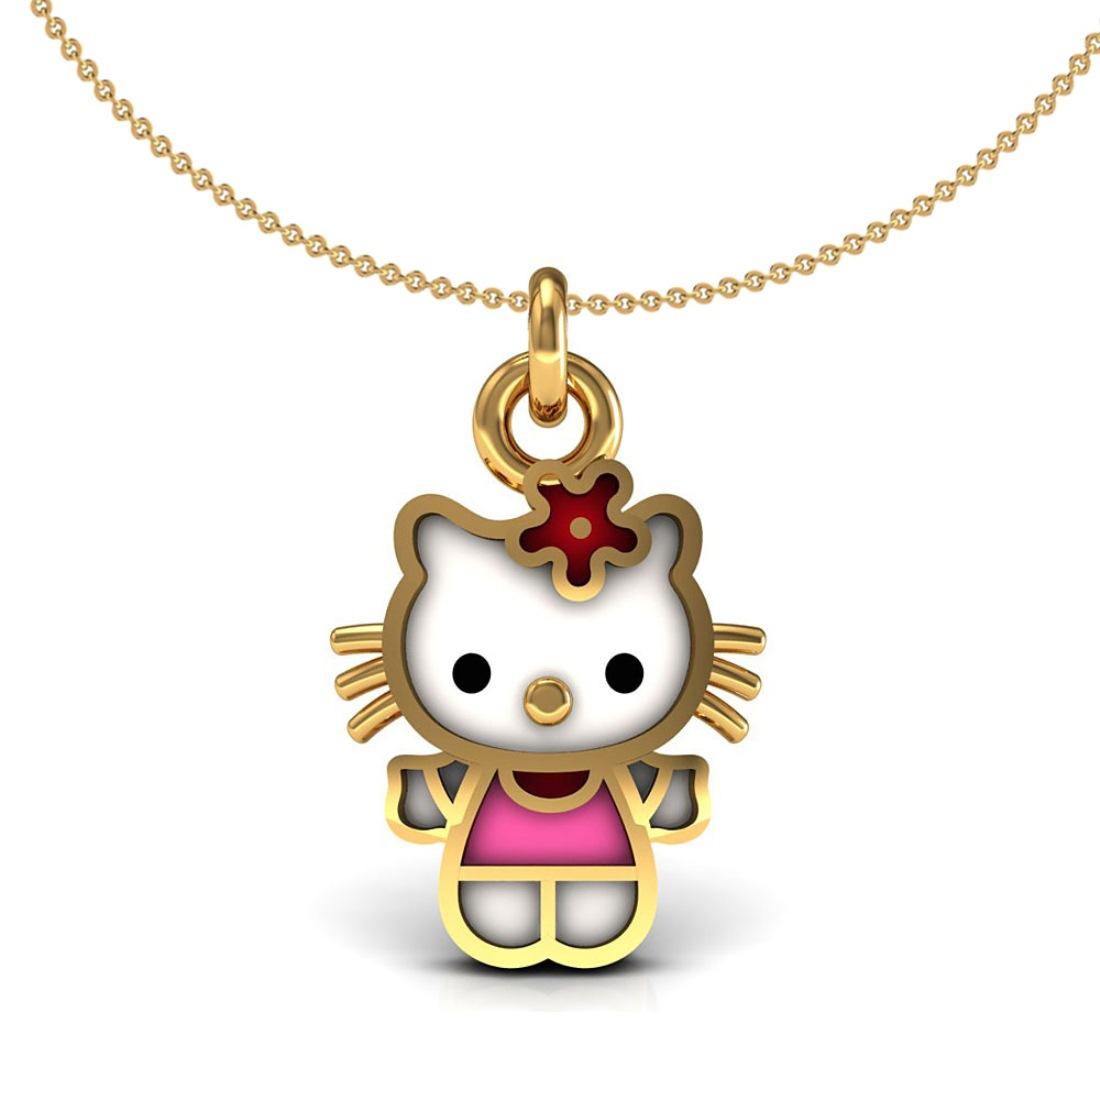 18k gold enamel teddy kids pendant with chain